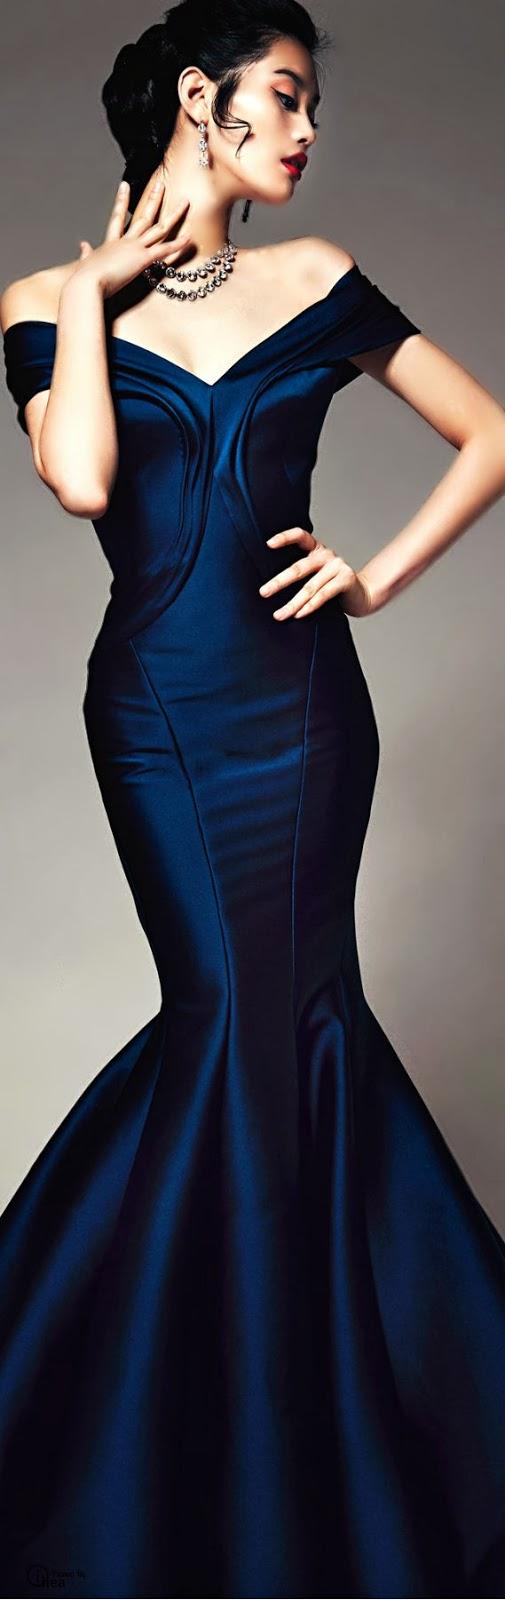 Amazing fashionable dark blue night dress - woman inspiration